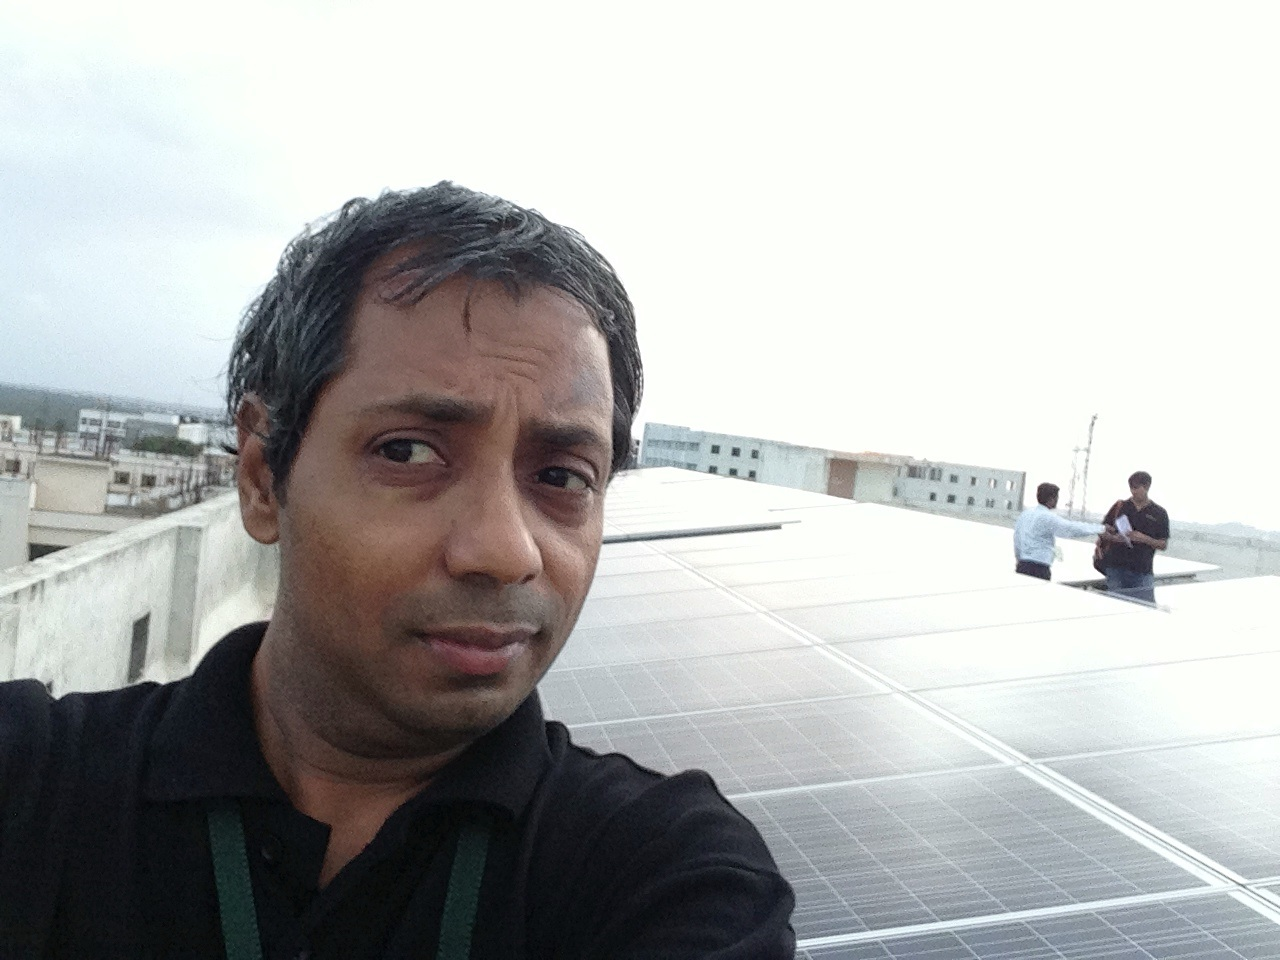 mcet-solar-panel-40-kW-view-1